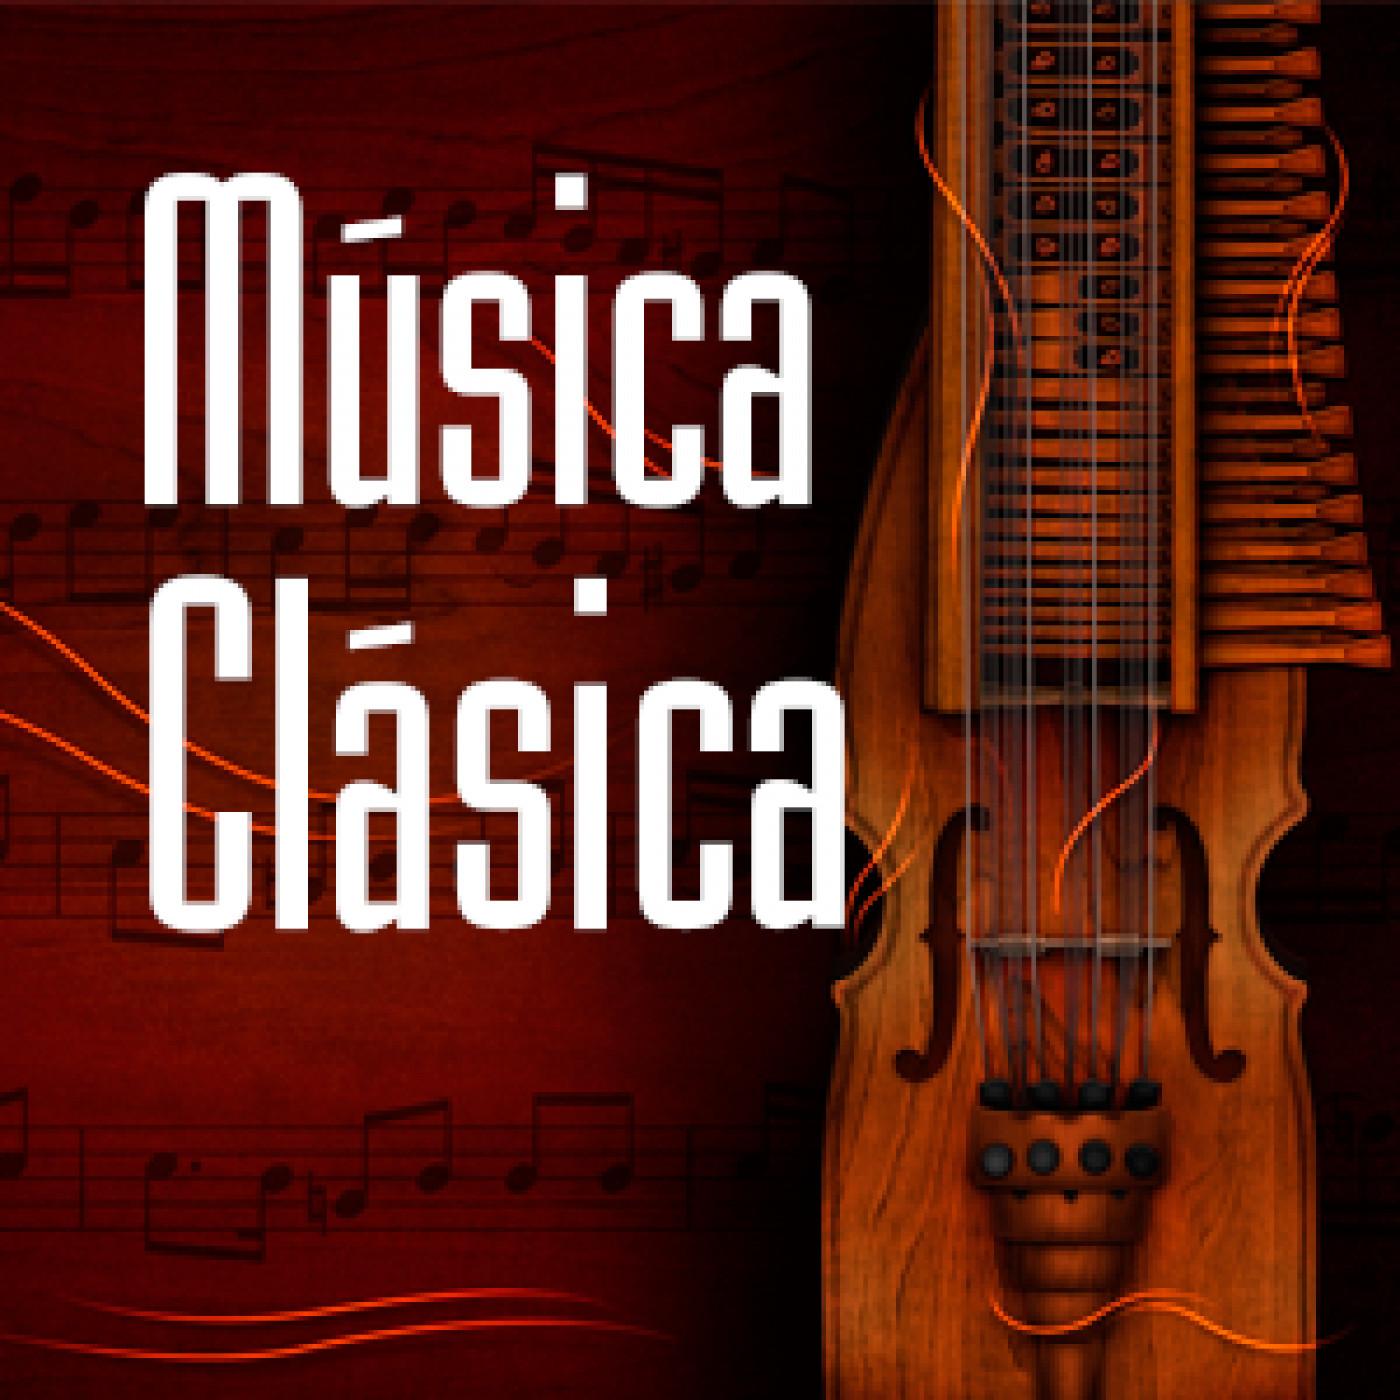 Escucha m sica cl sica grandes compositores ivoox for Musica clasica para entrenar